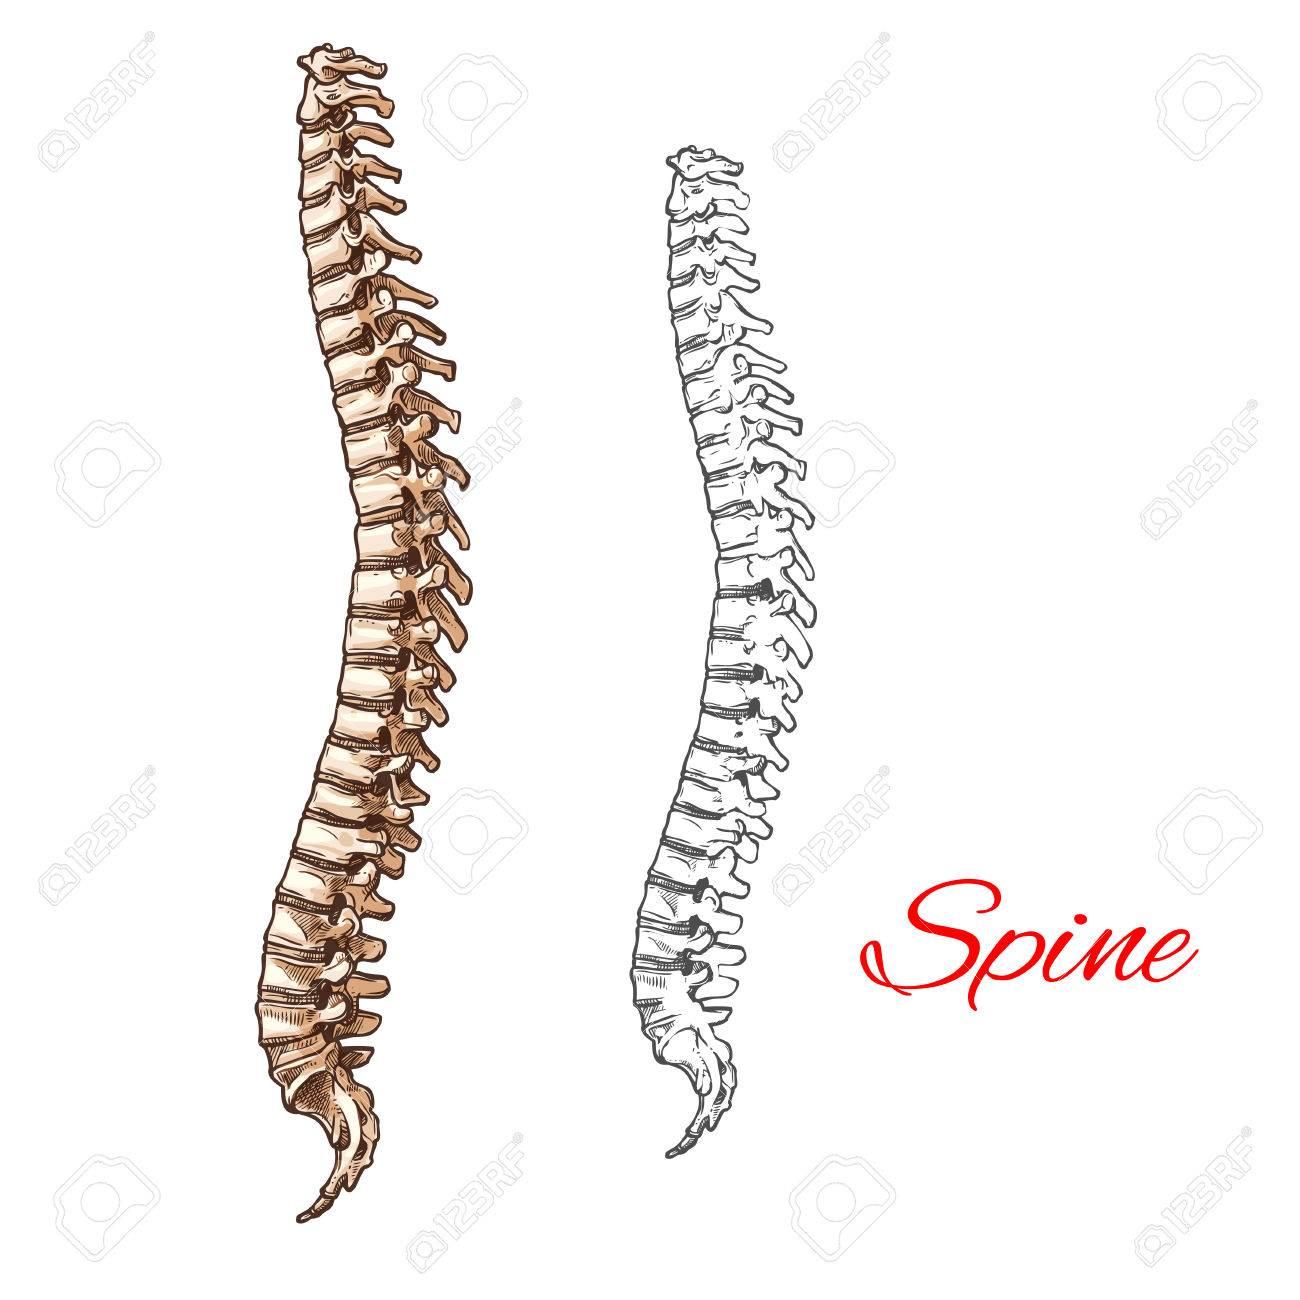 Human Spine Bones And Backbone Joints Vector Sketch Body Anatomy